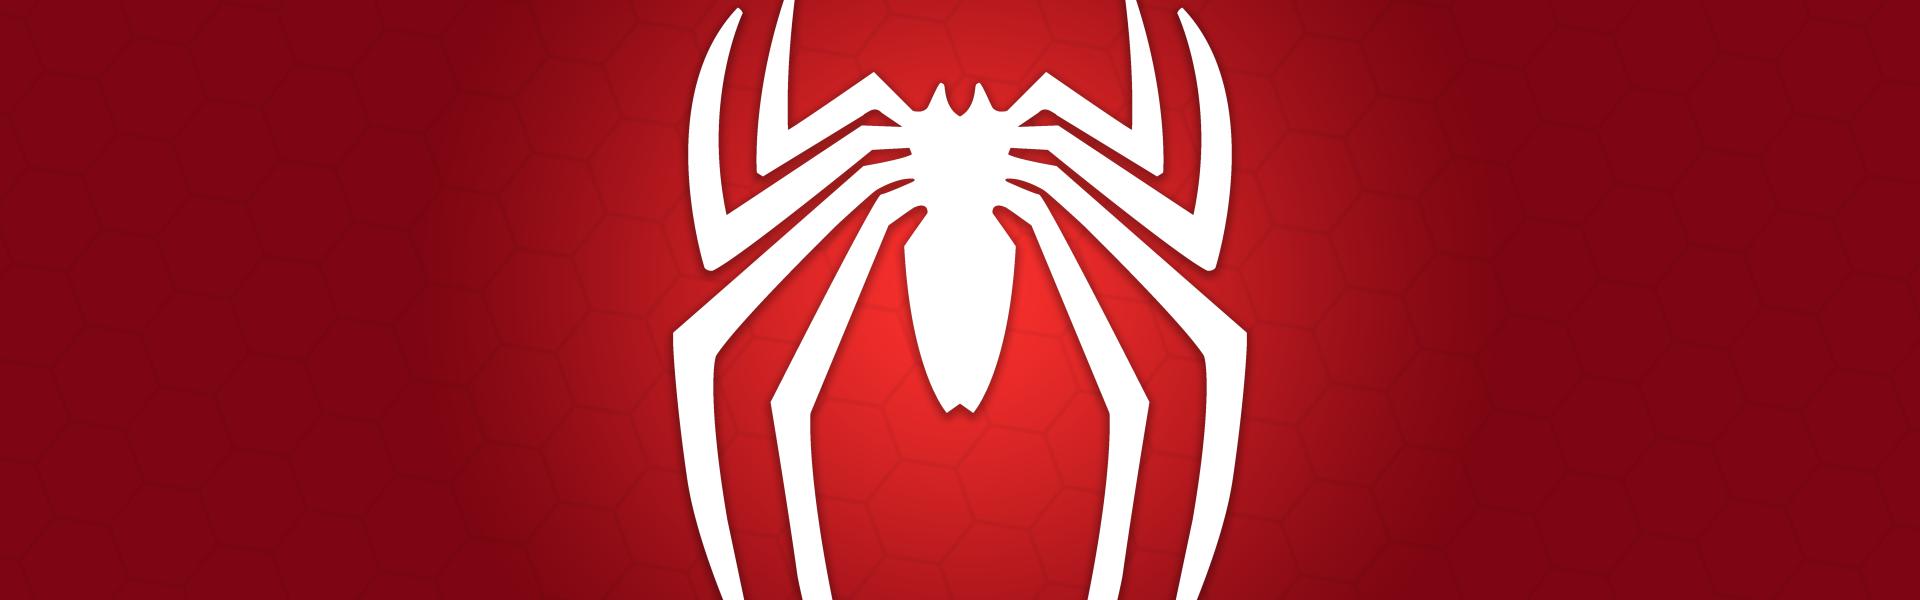 Spider-Man spider symbol banner : PS4Banners